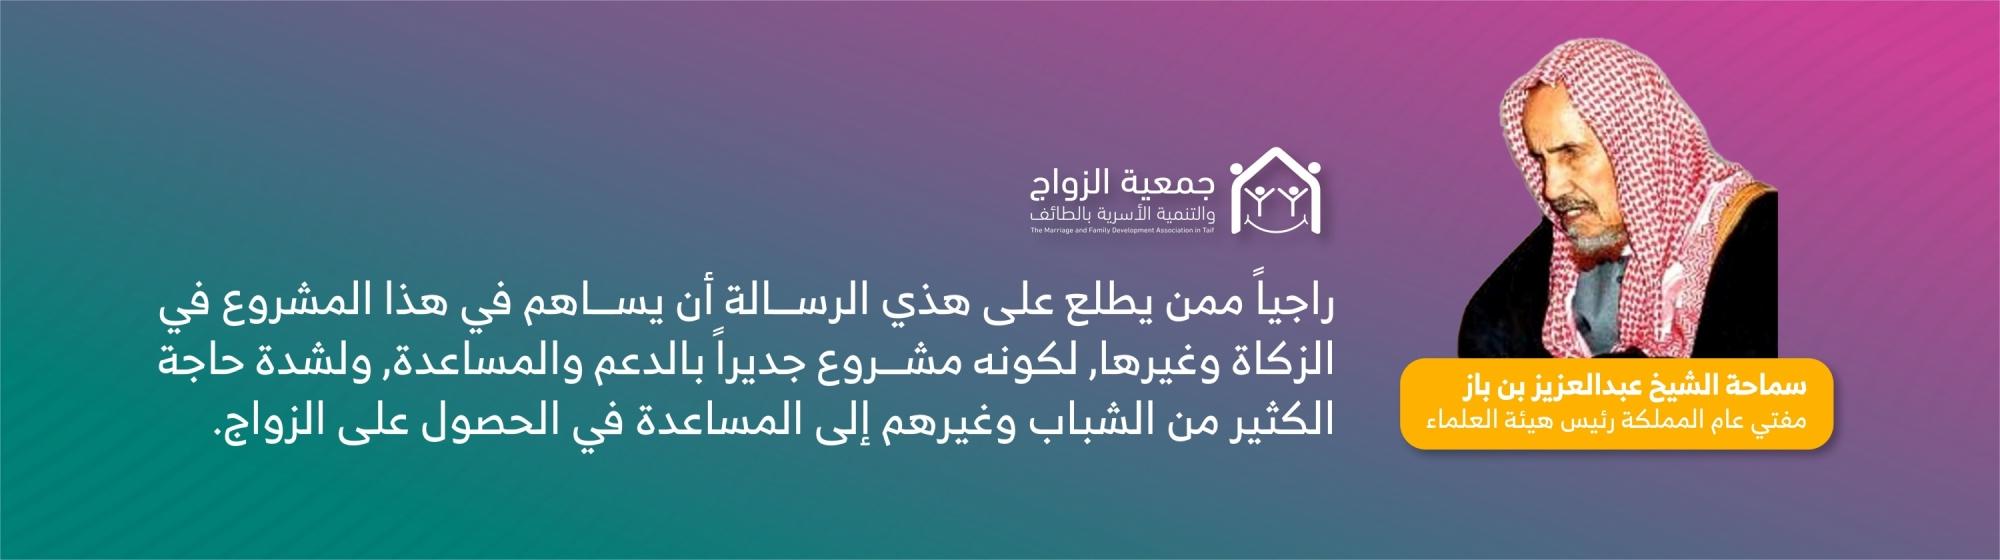 عبدالعزيز بن باز 1